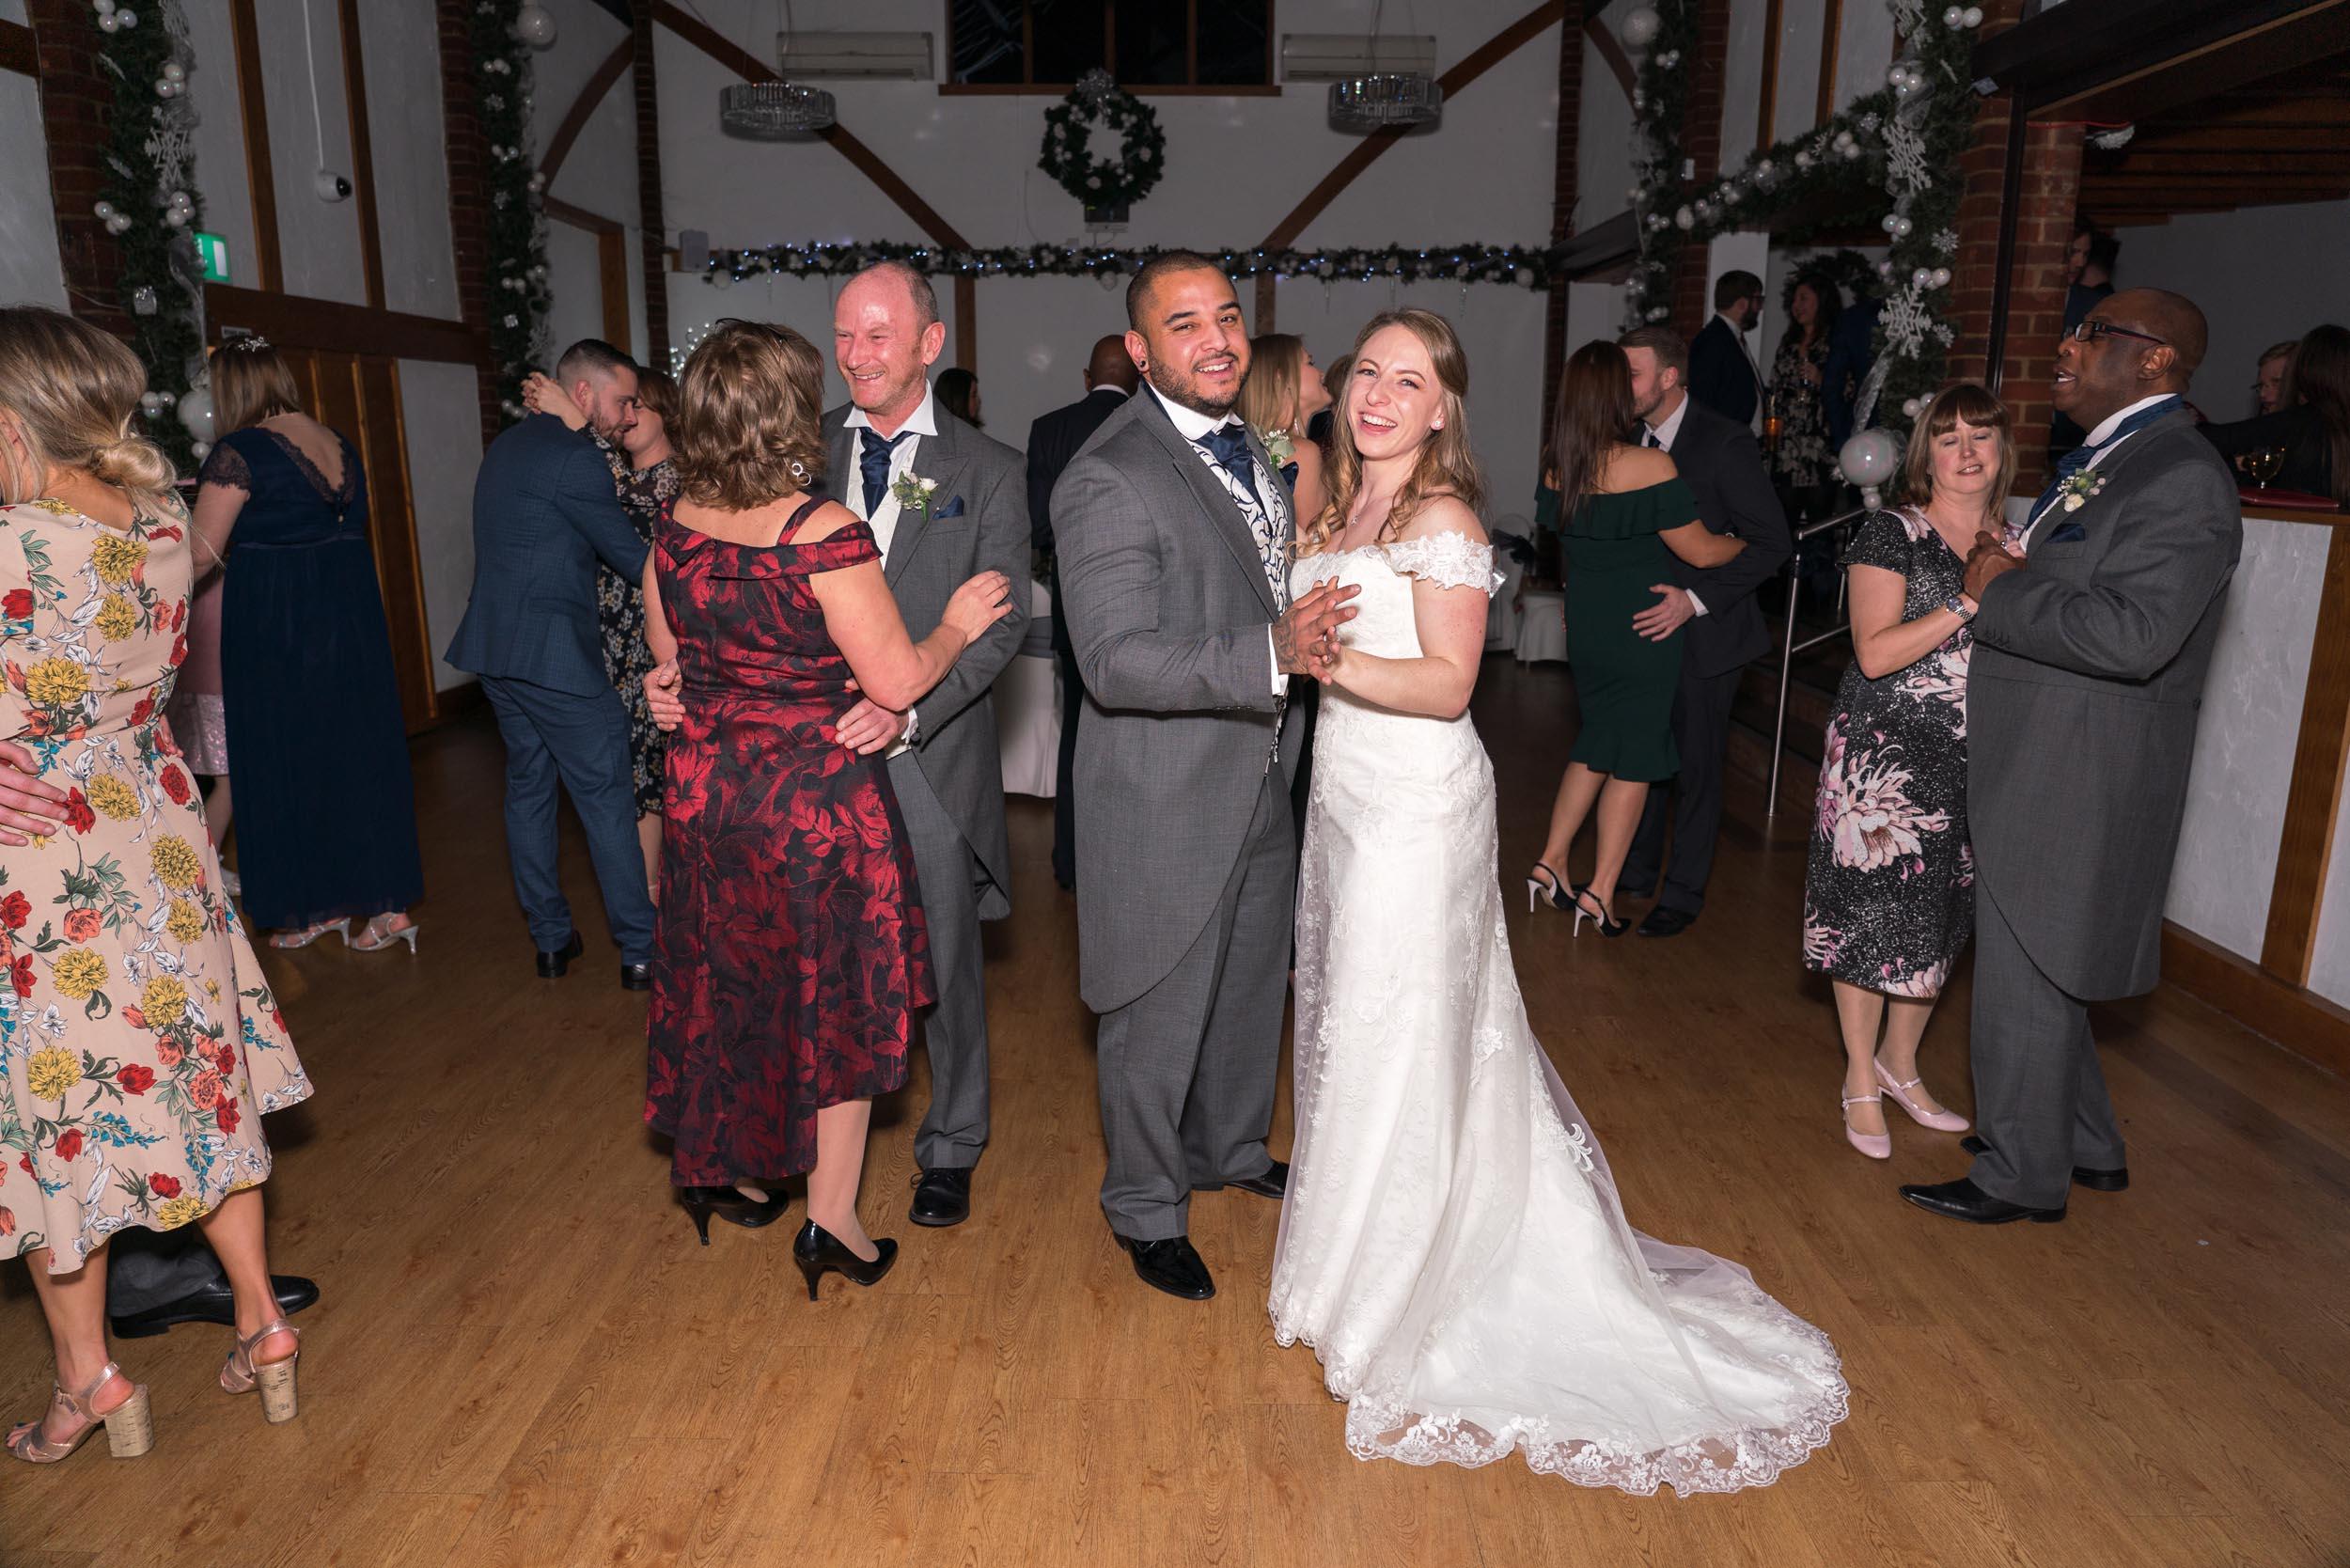 Ye Olde Plough House Cavalier Suite Dance Floor with Wedding Bride and Groom